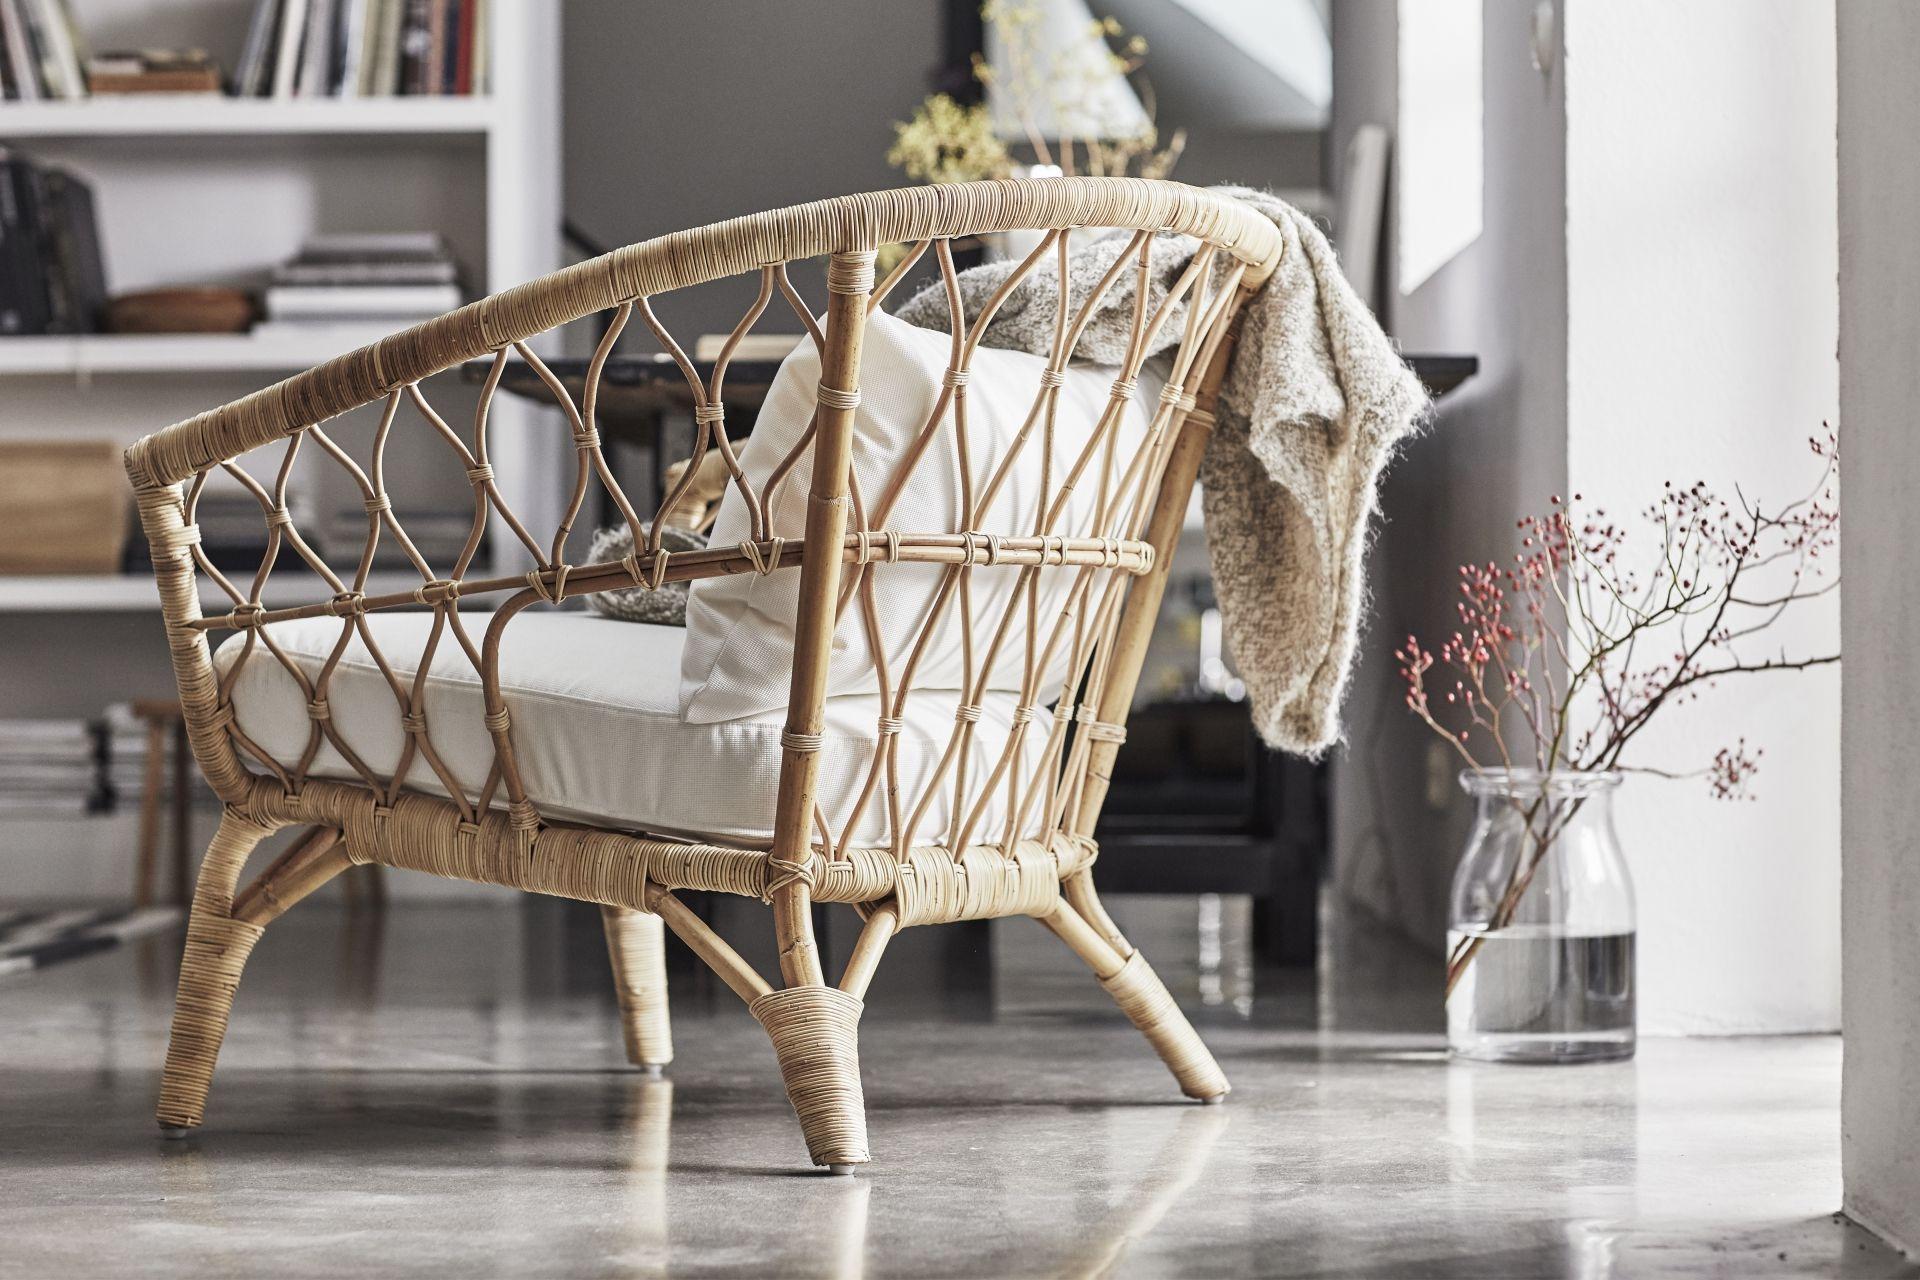 Ikea Witte Stoel : Stockholm fauteuil ikea ikeanl ikeanederland inspiratie